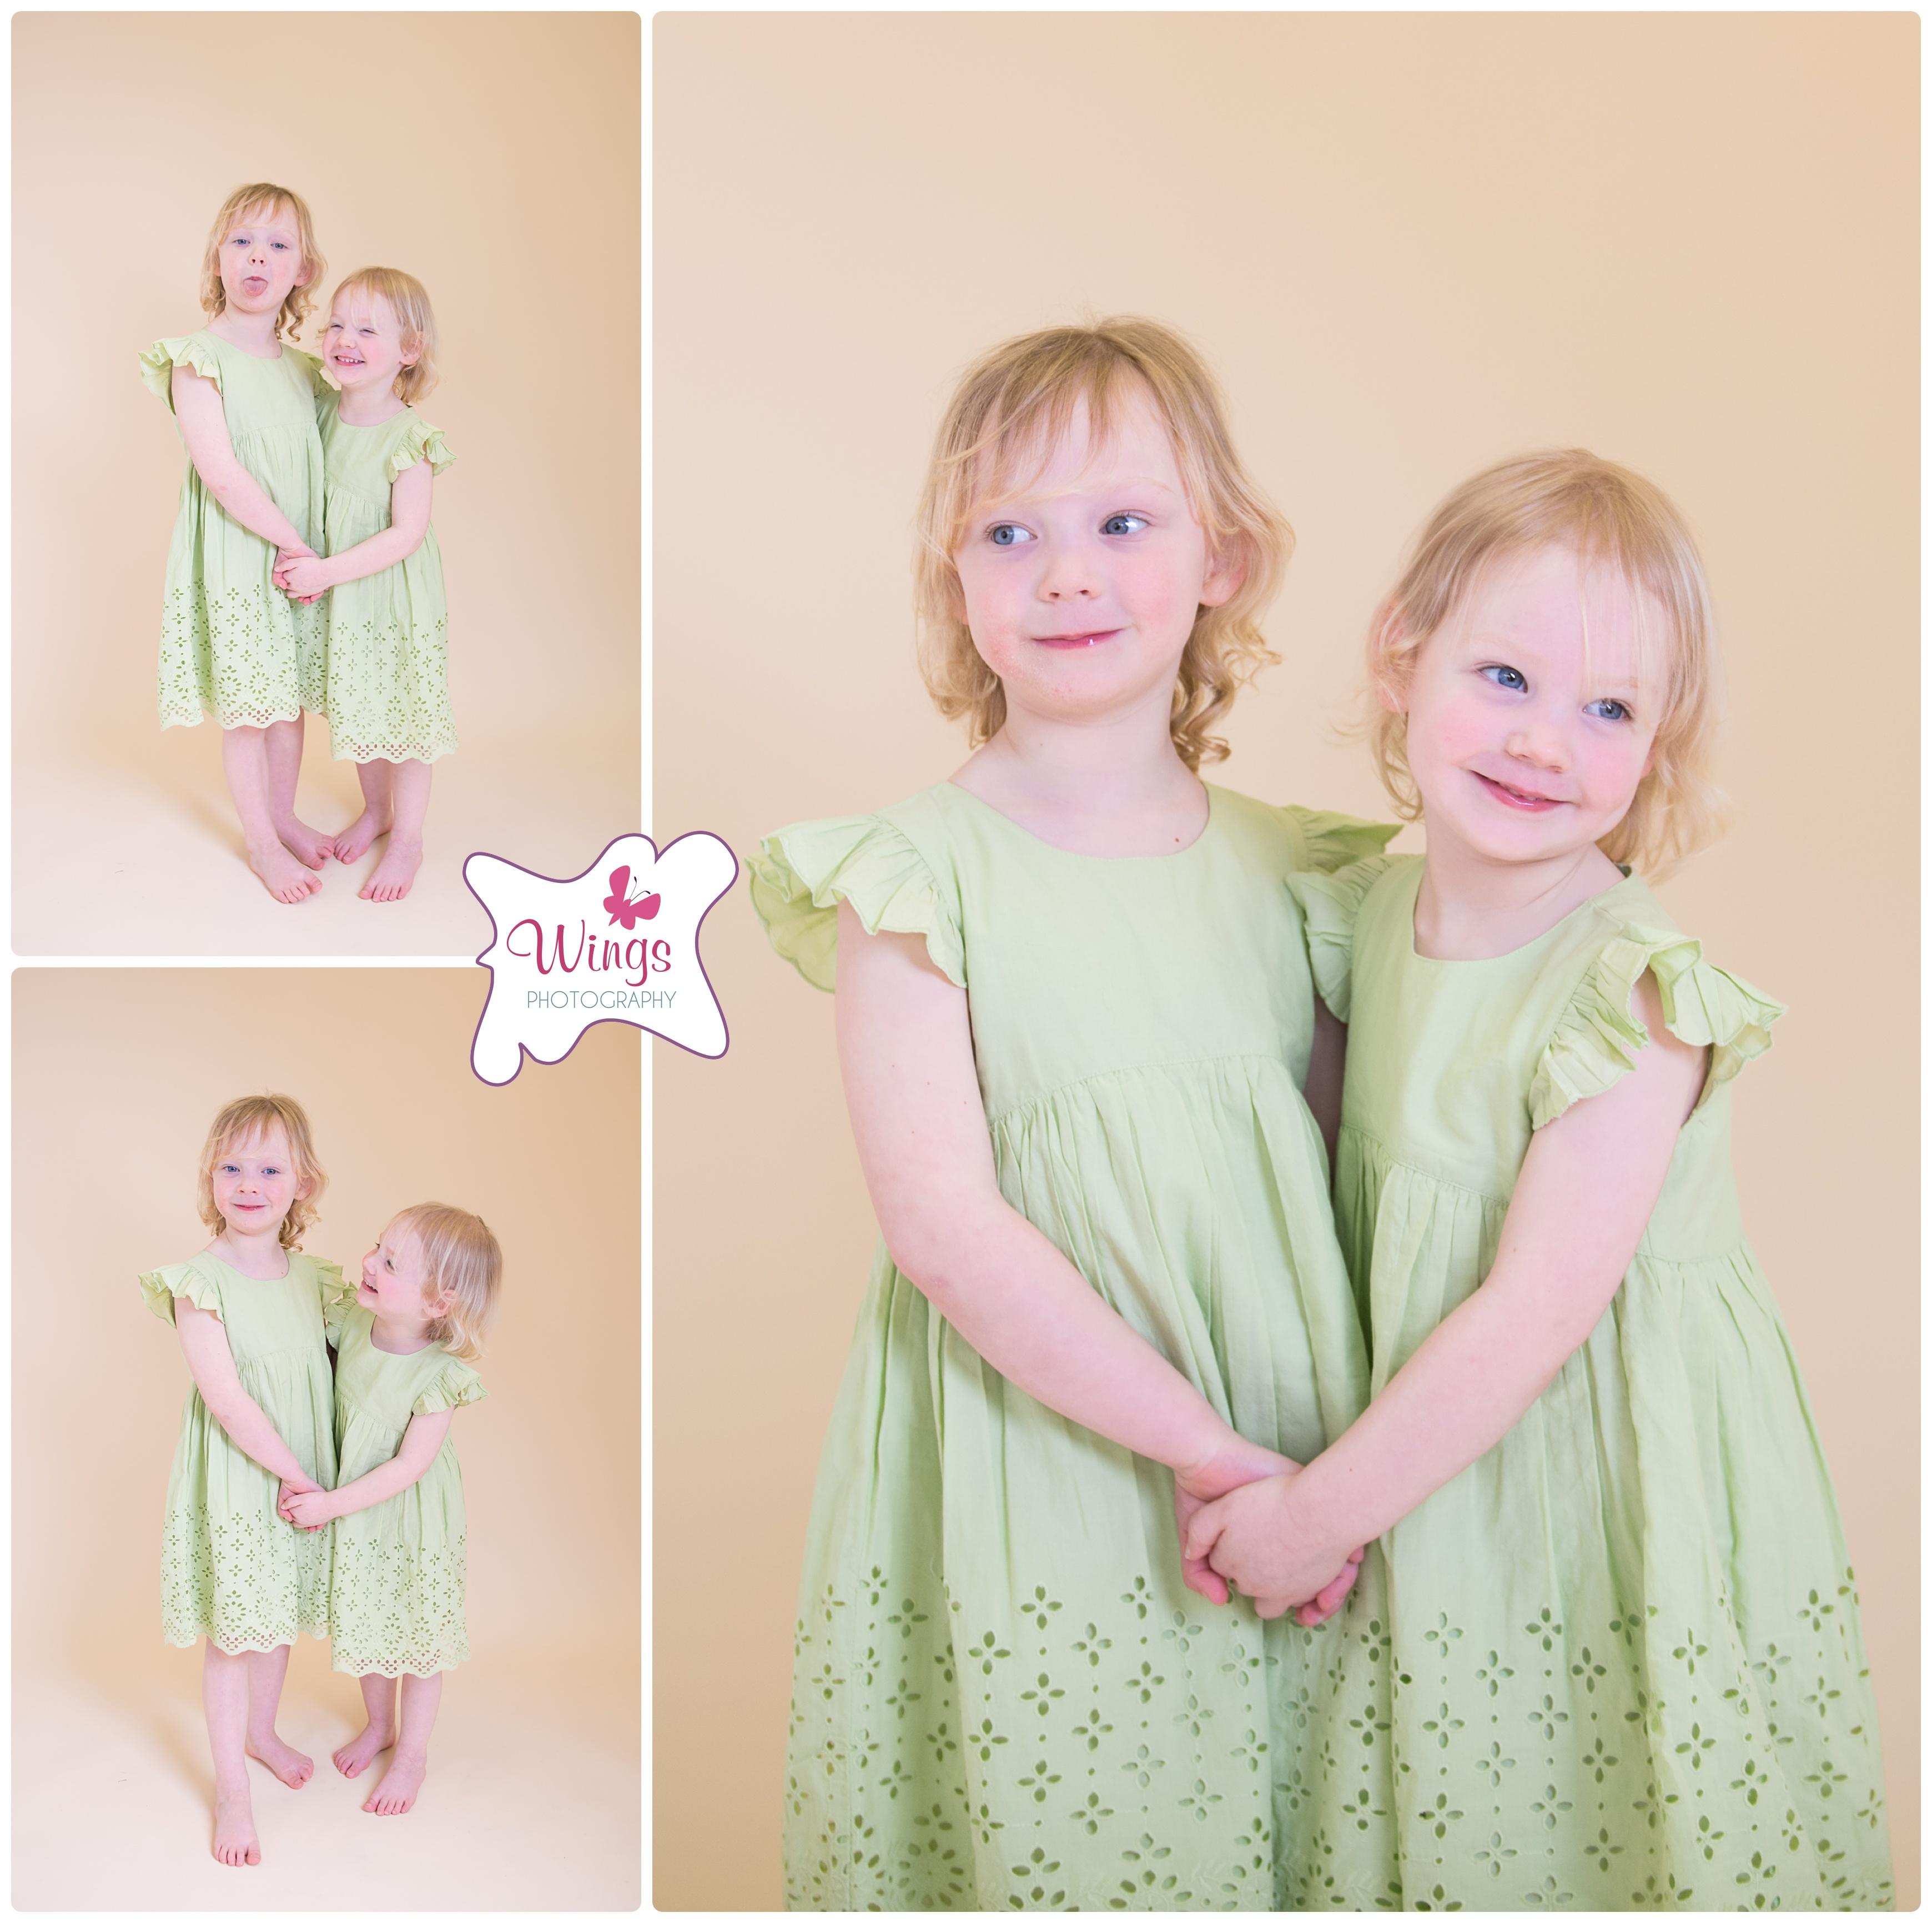 Childrens studio photography